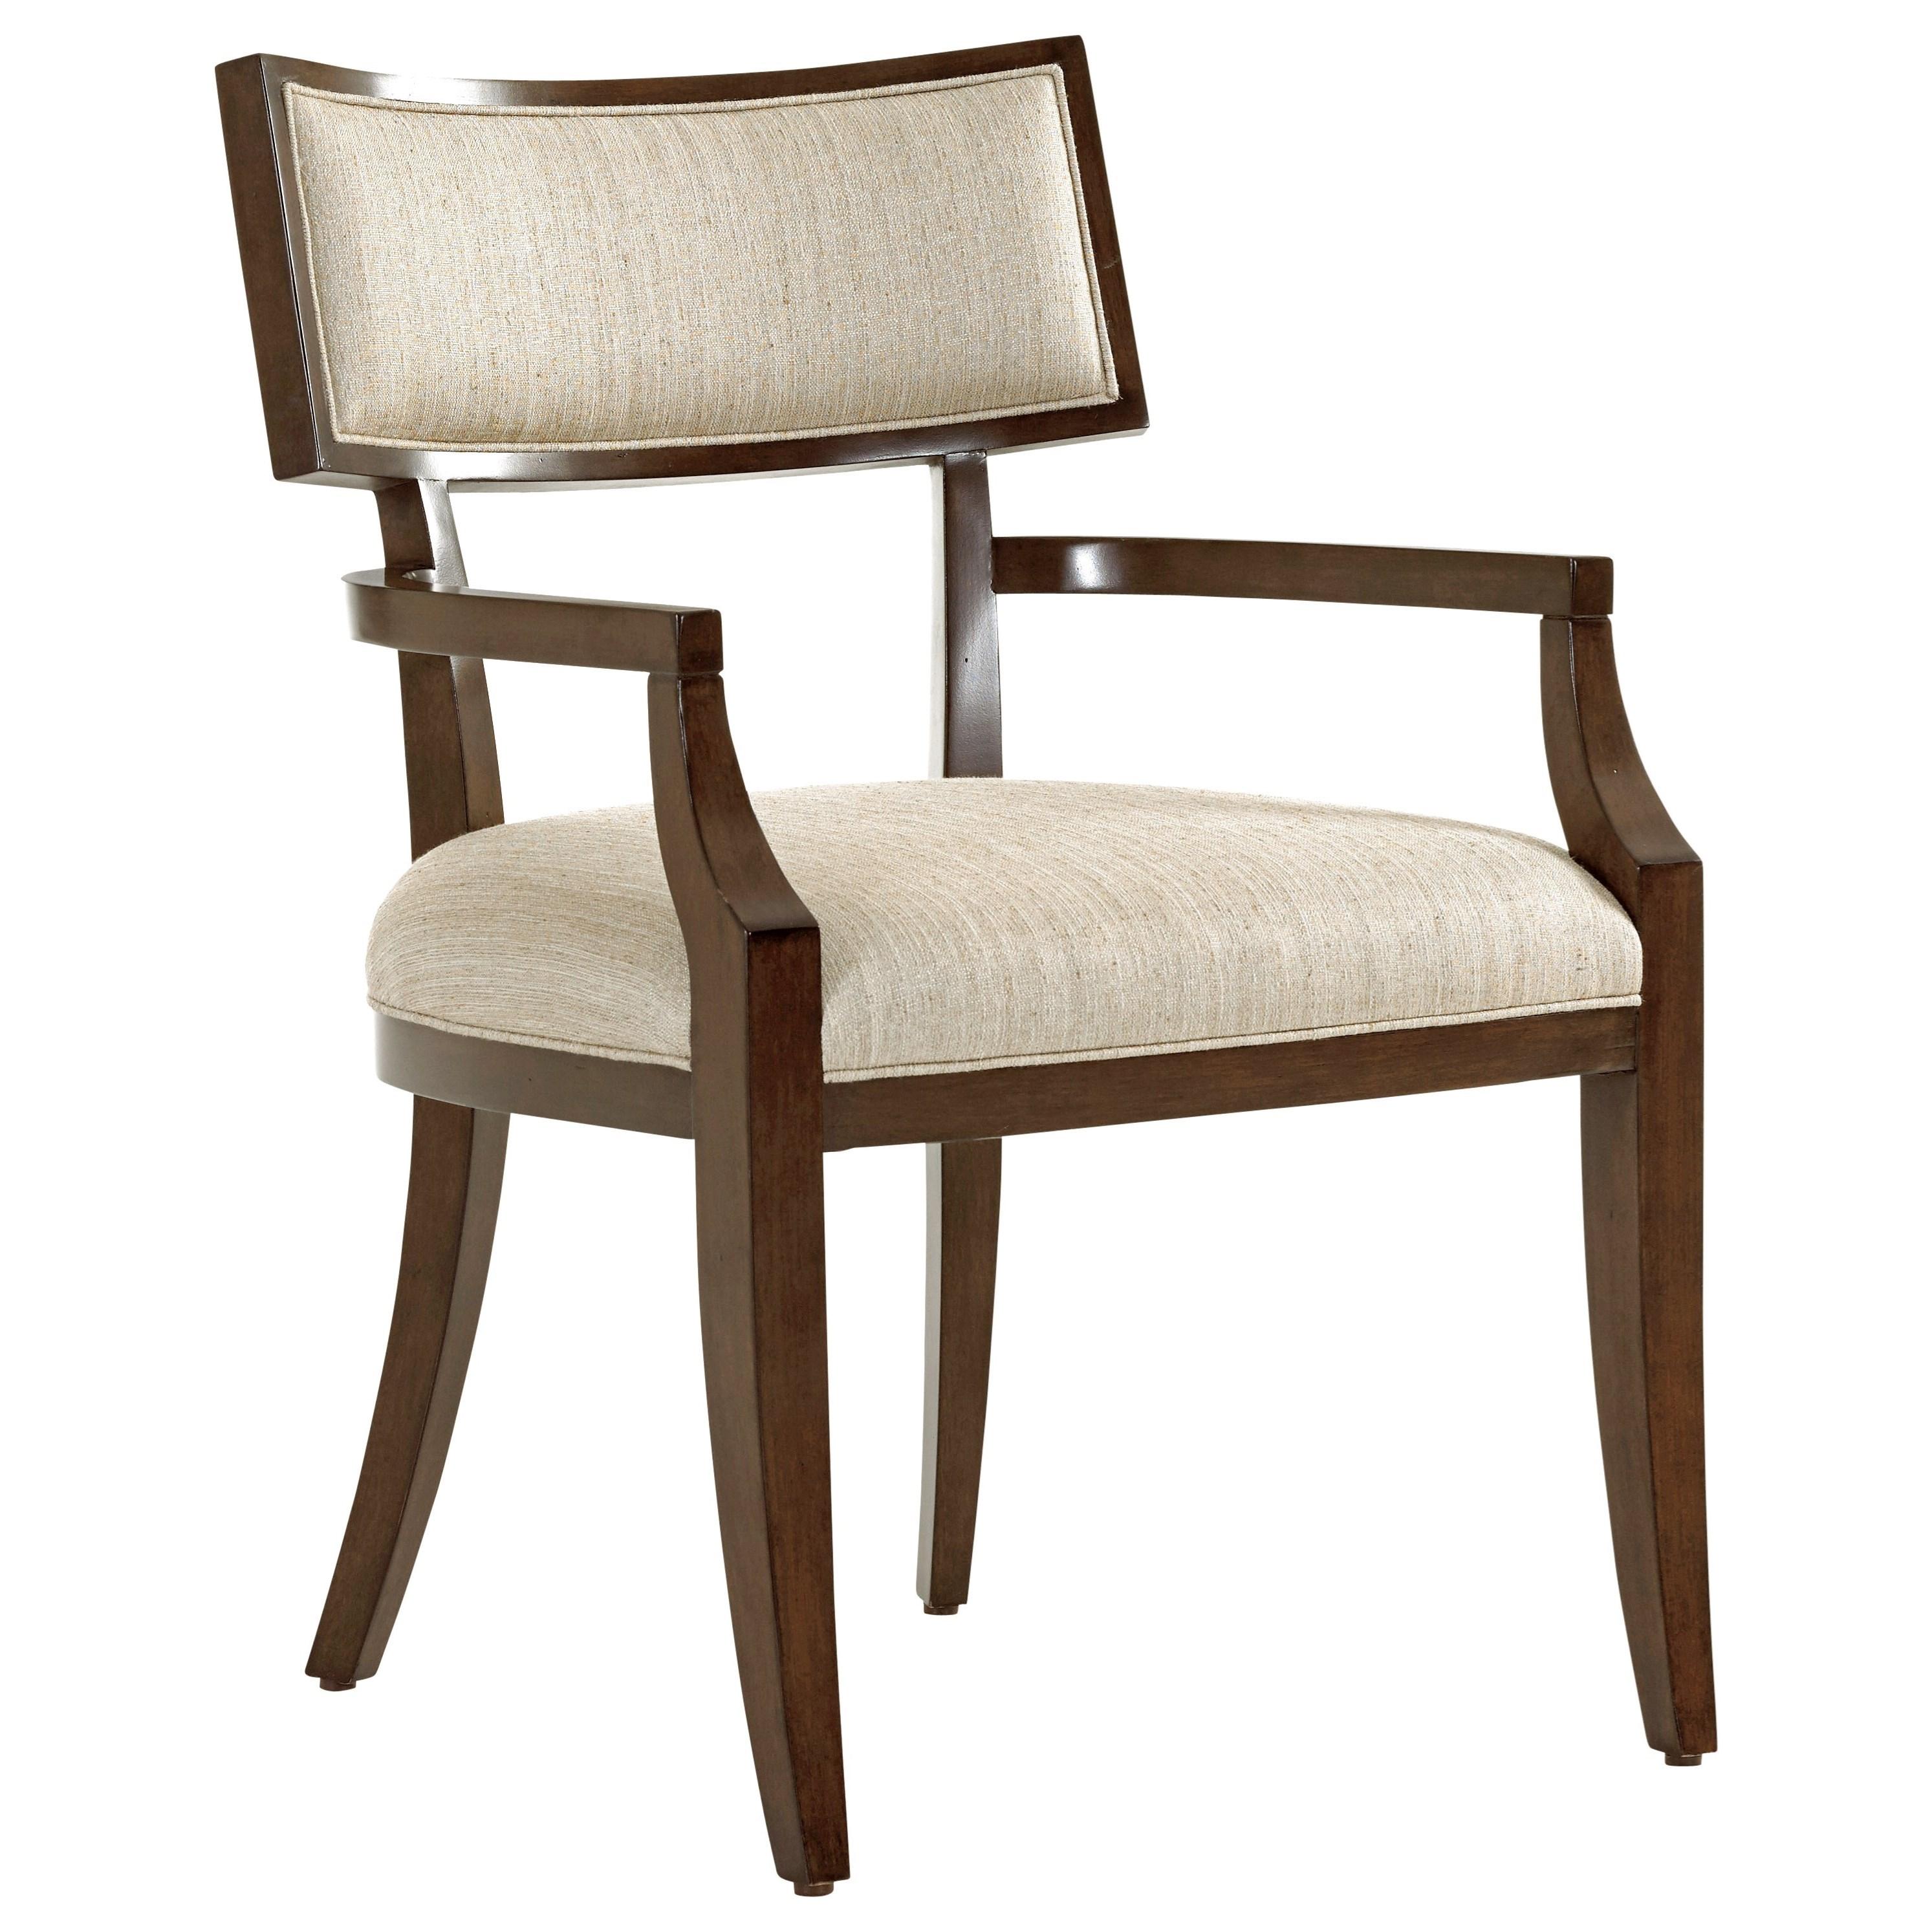 MacArthur Park Whittier Arm Chair in Wheat Fabric by Lexington at Johnny Janosik